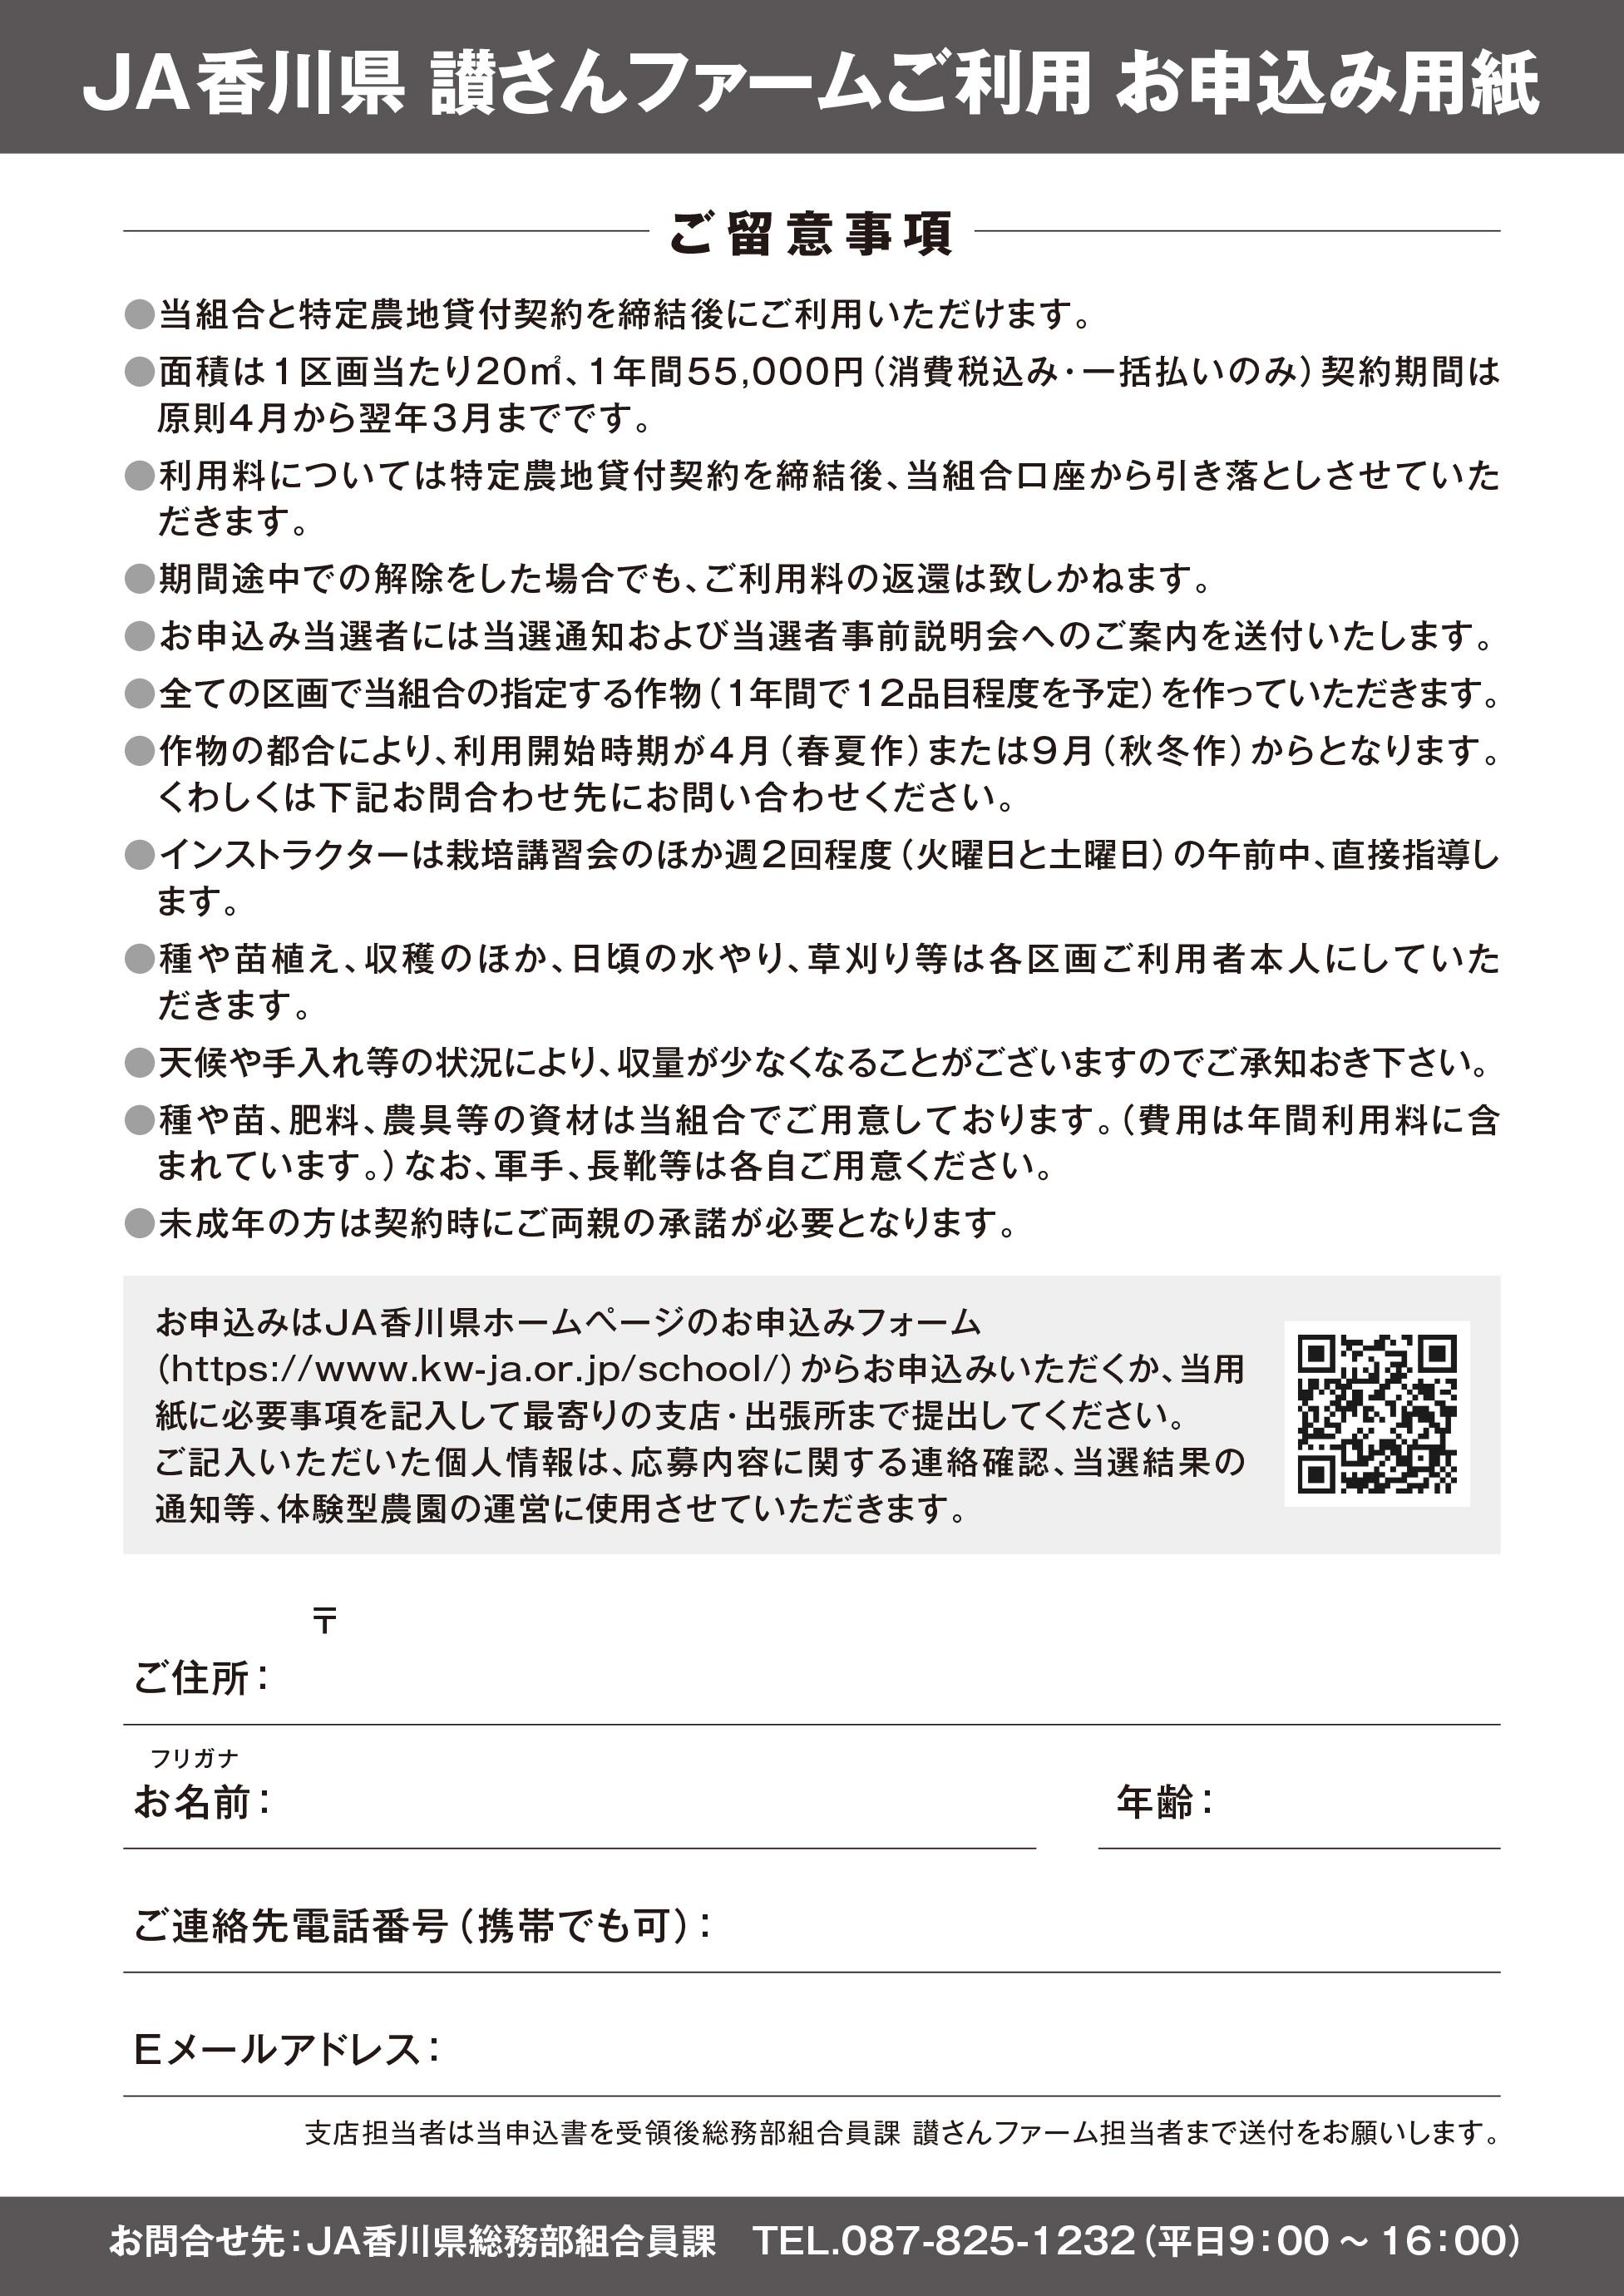 JA香川県 讃さんファームご利用お申込み用紙